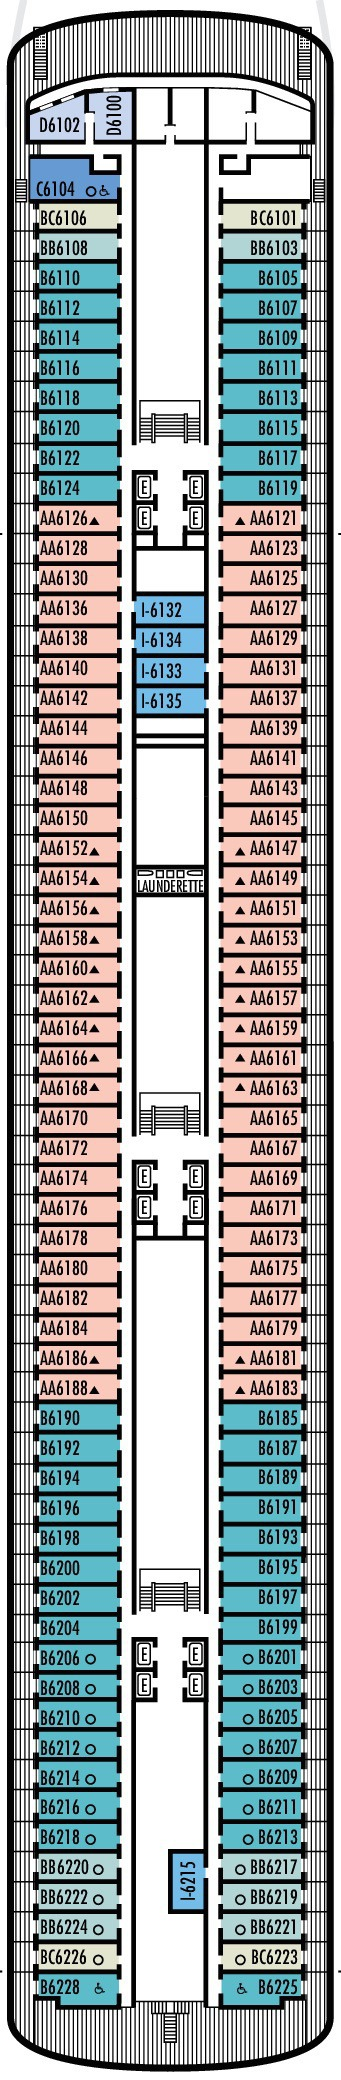 Holland America Line - Volendam & Zaandam deck plans - Deck 6